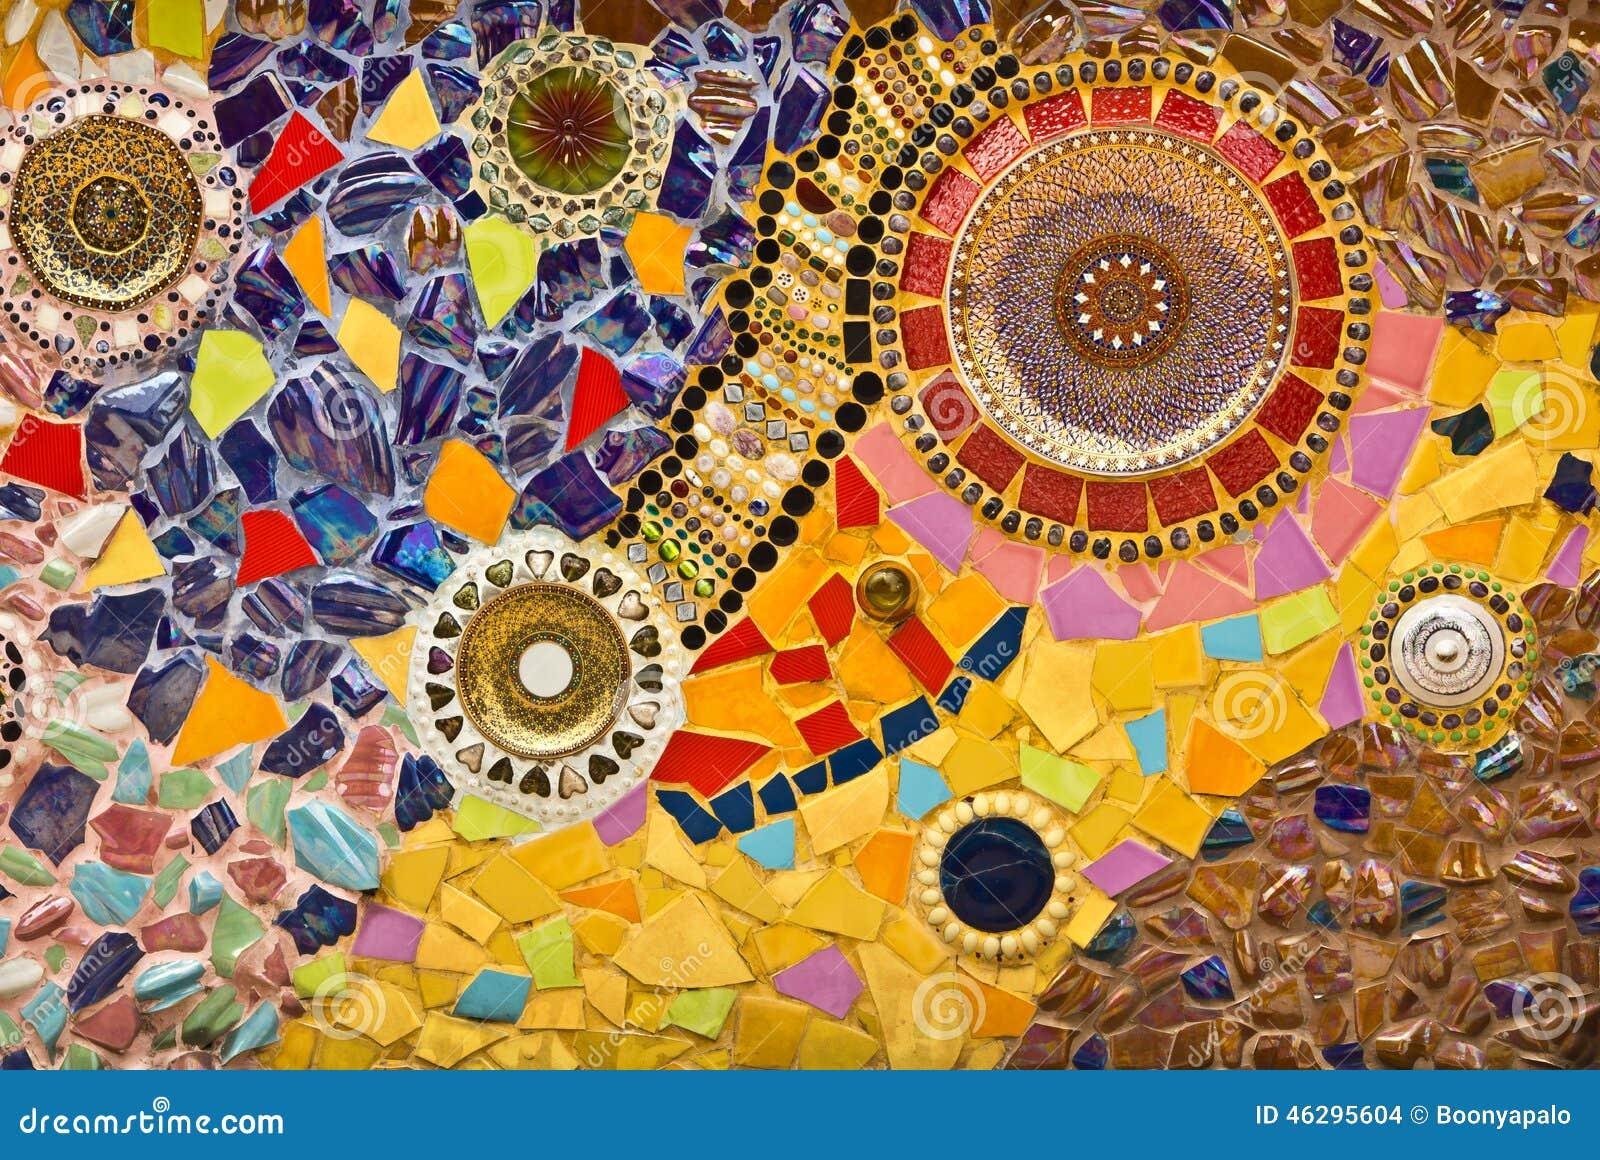 Mosaic Wall Decorative Ornament From Ceramic Broken Tile Stock Photo ...